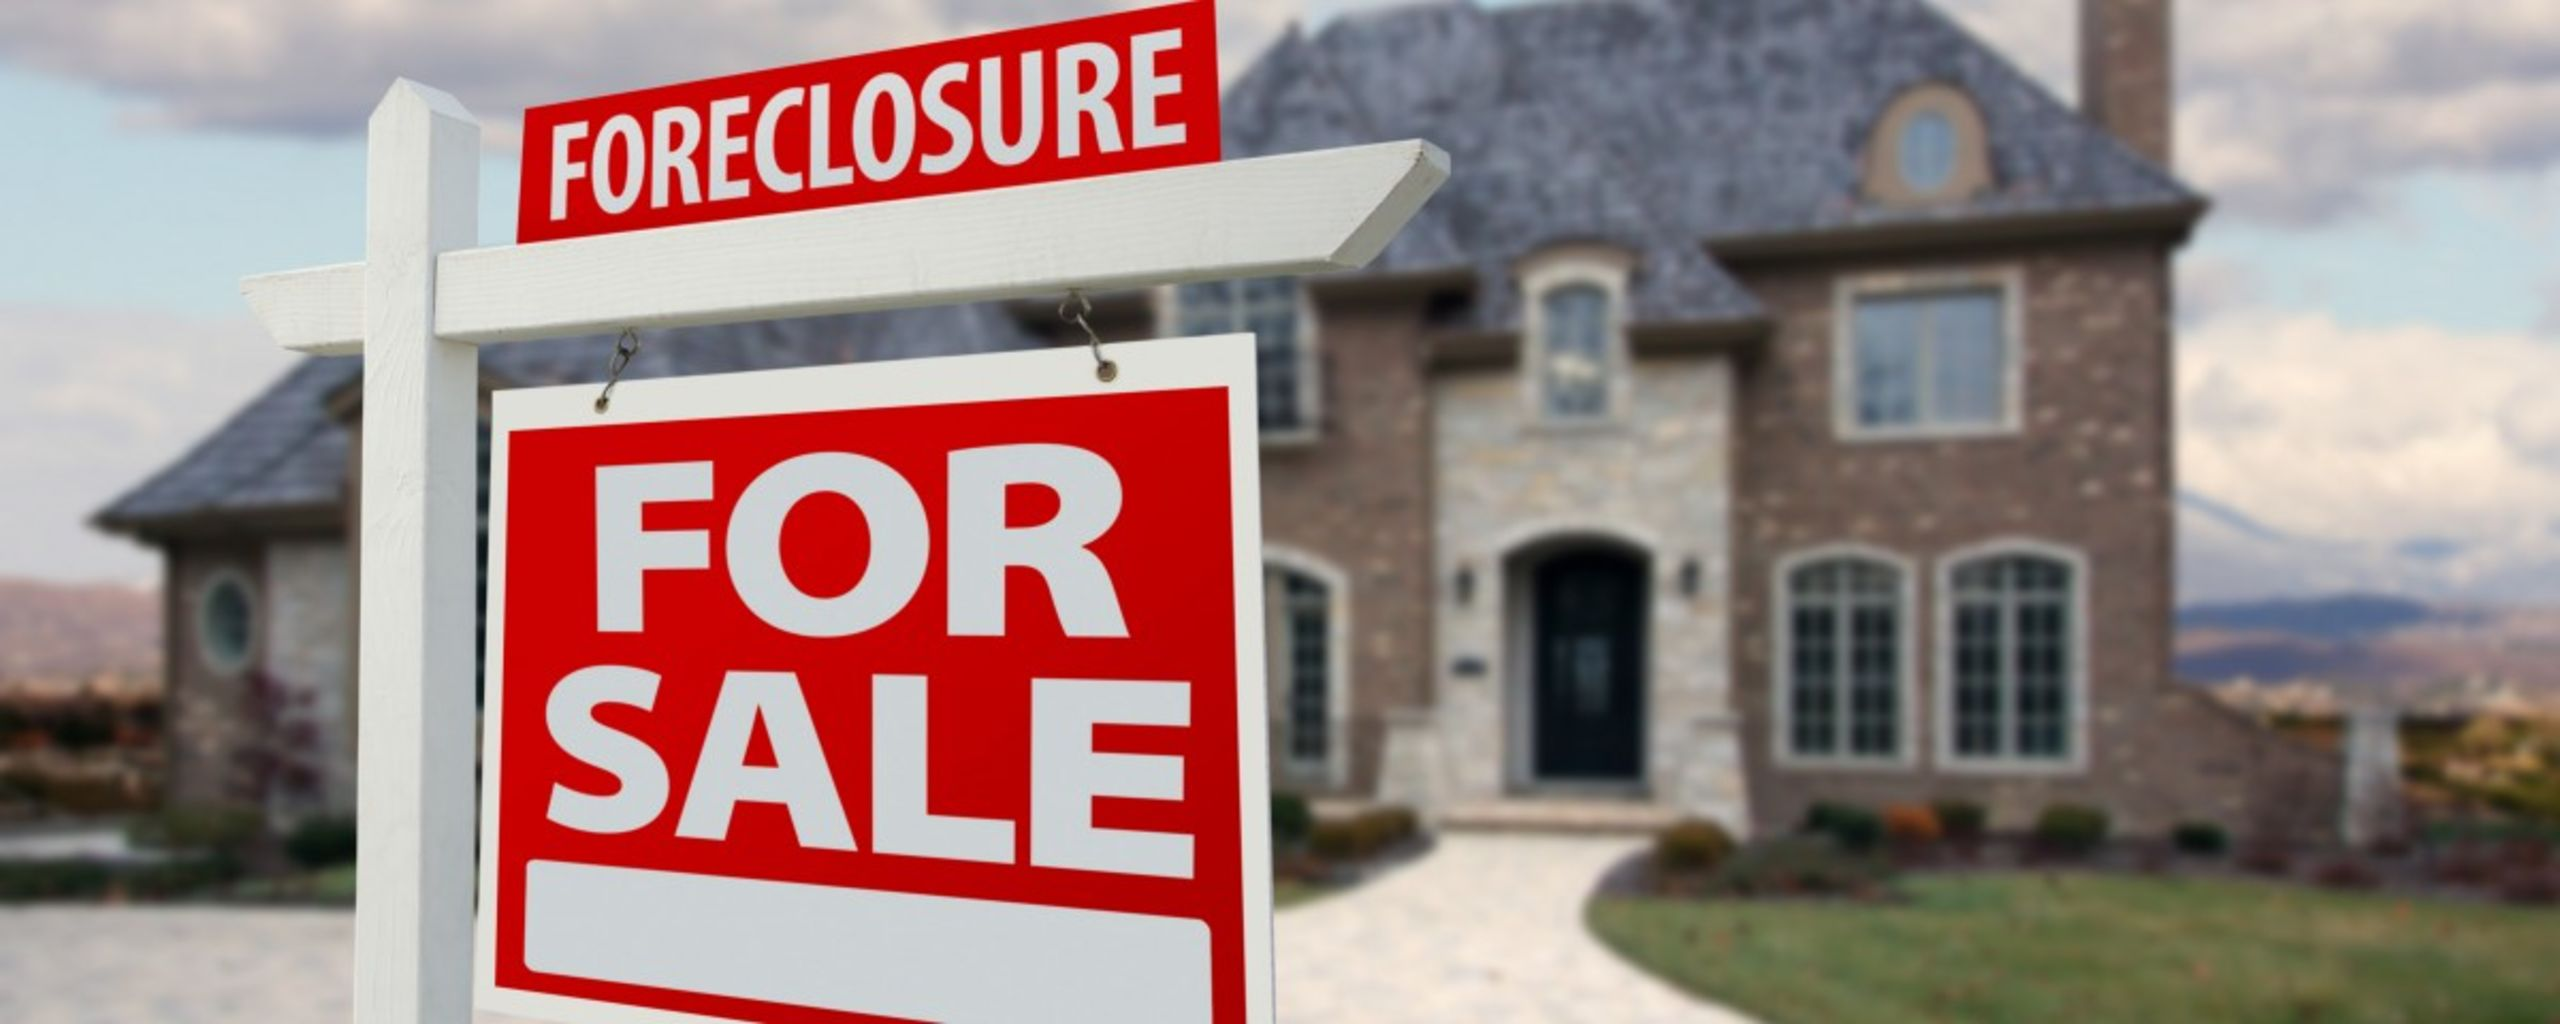 Real estate broker germantown collierville Lakeland Eads cordova olive branch